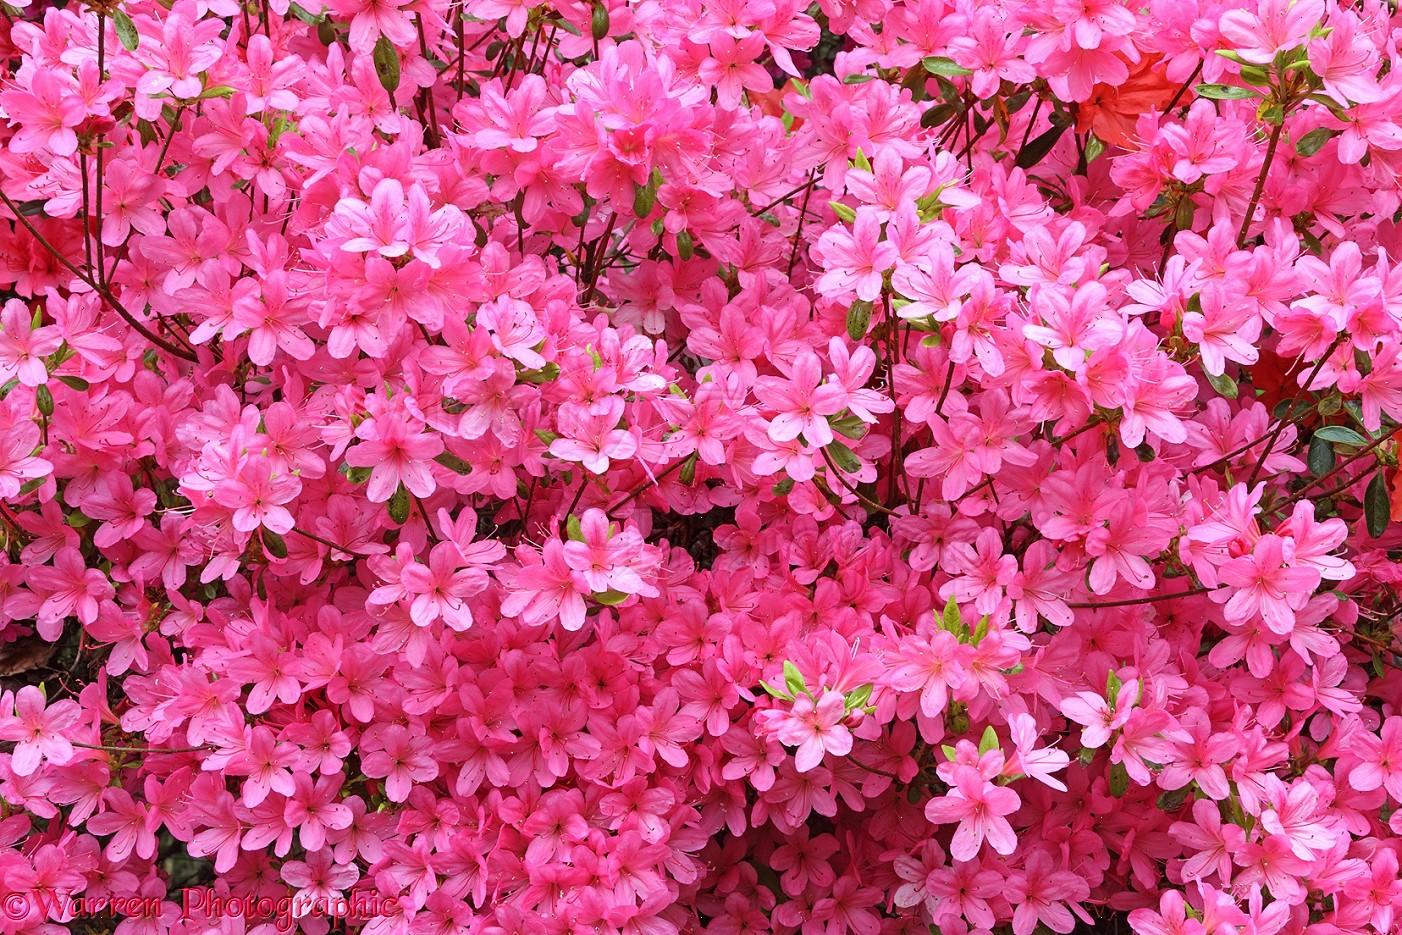 Wp27988 pink azalea flowers